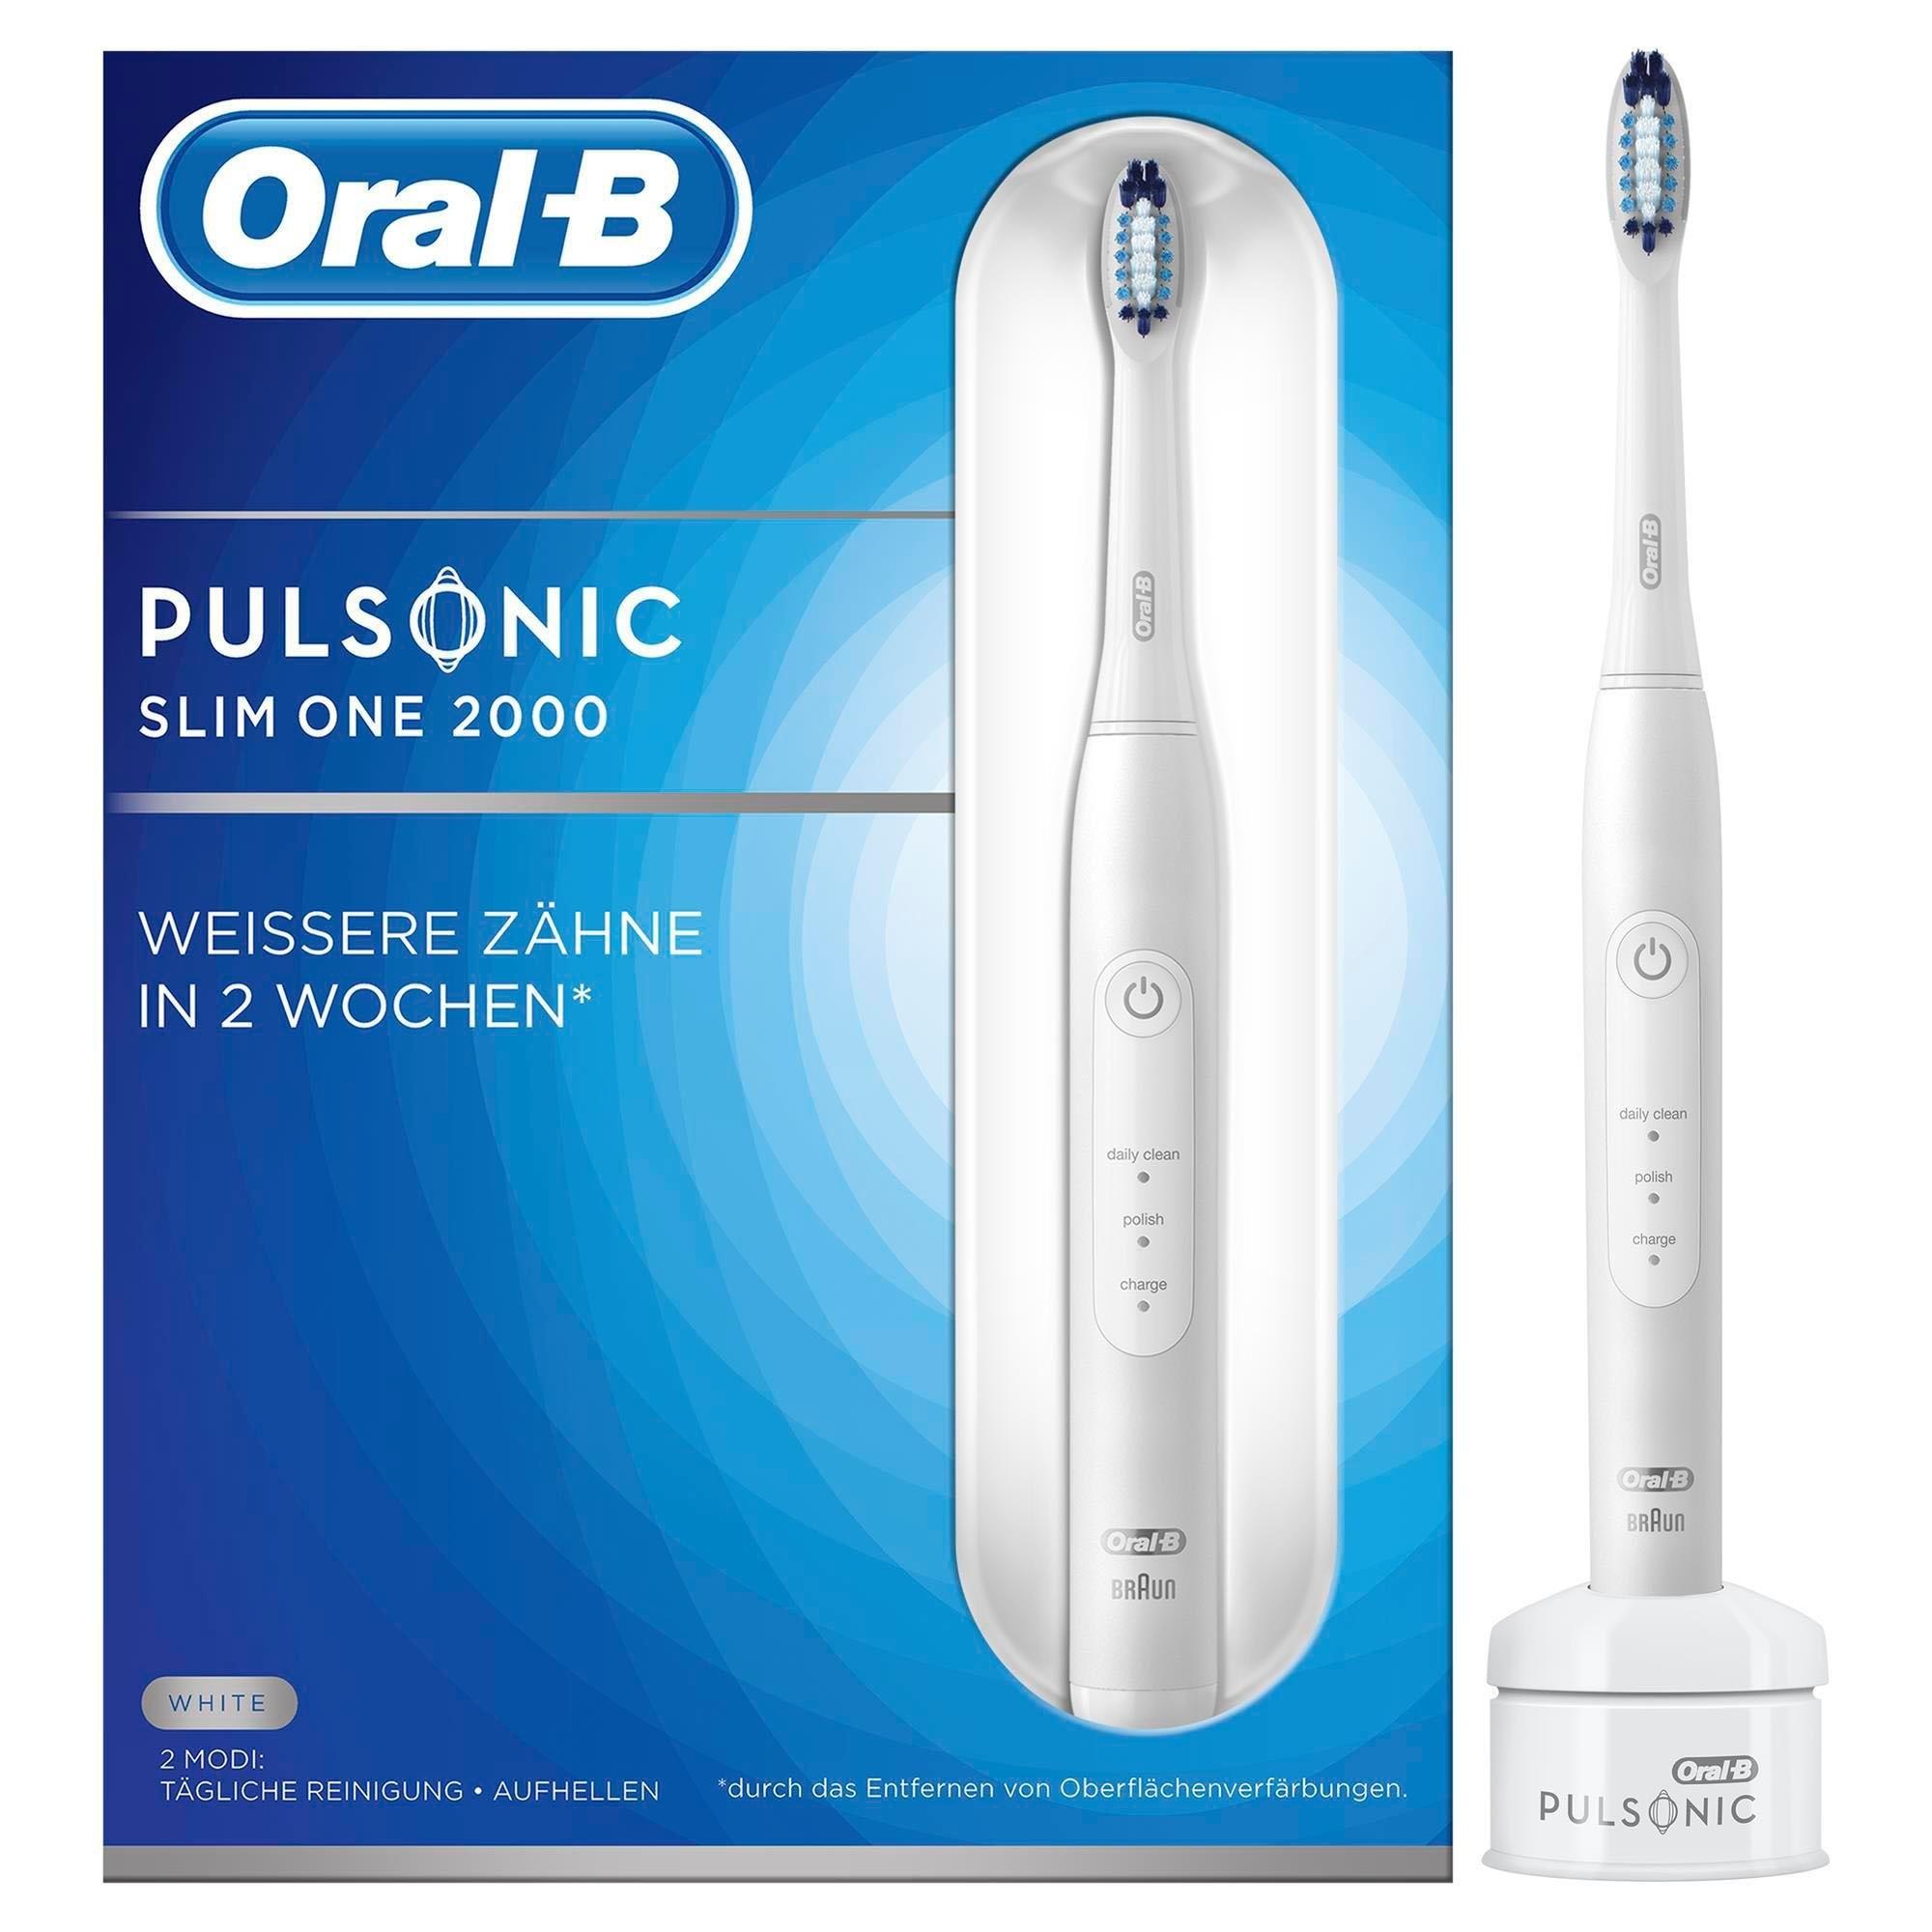 Oral-B Oral B ultrasone tandenborstel Pulsonic Slim One 2000, 1 opzetborsteltje veilig op otto.nl kopen